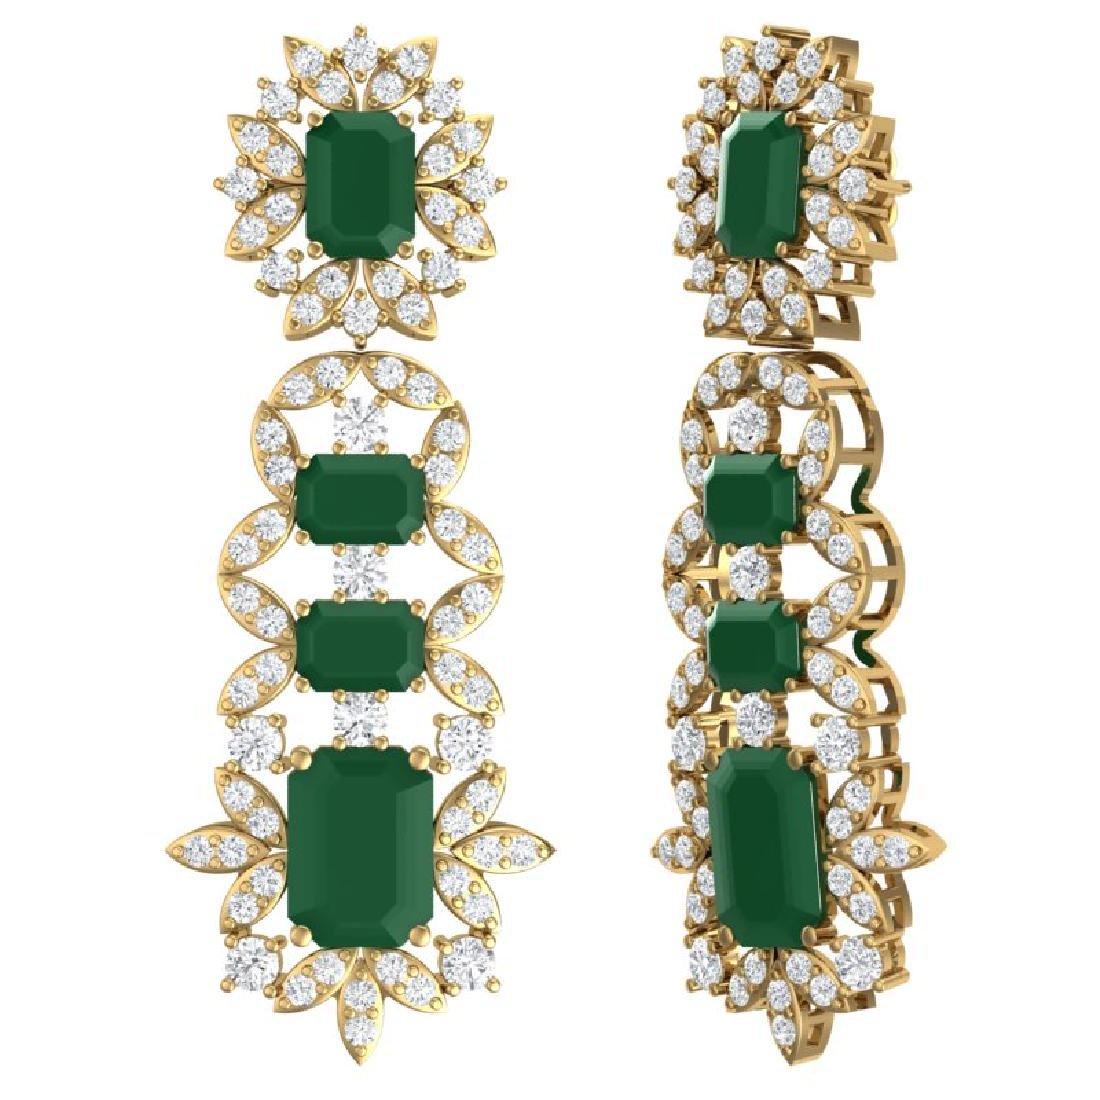 30.25 CTW Royalty Emerald & VS Diamond Earrings 18K - 3